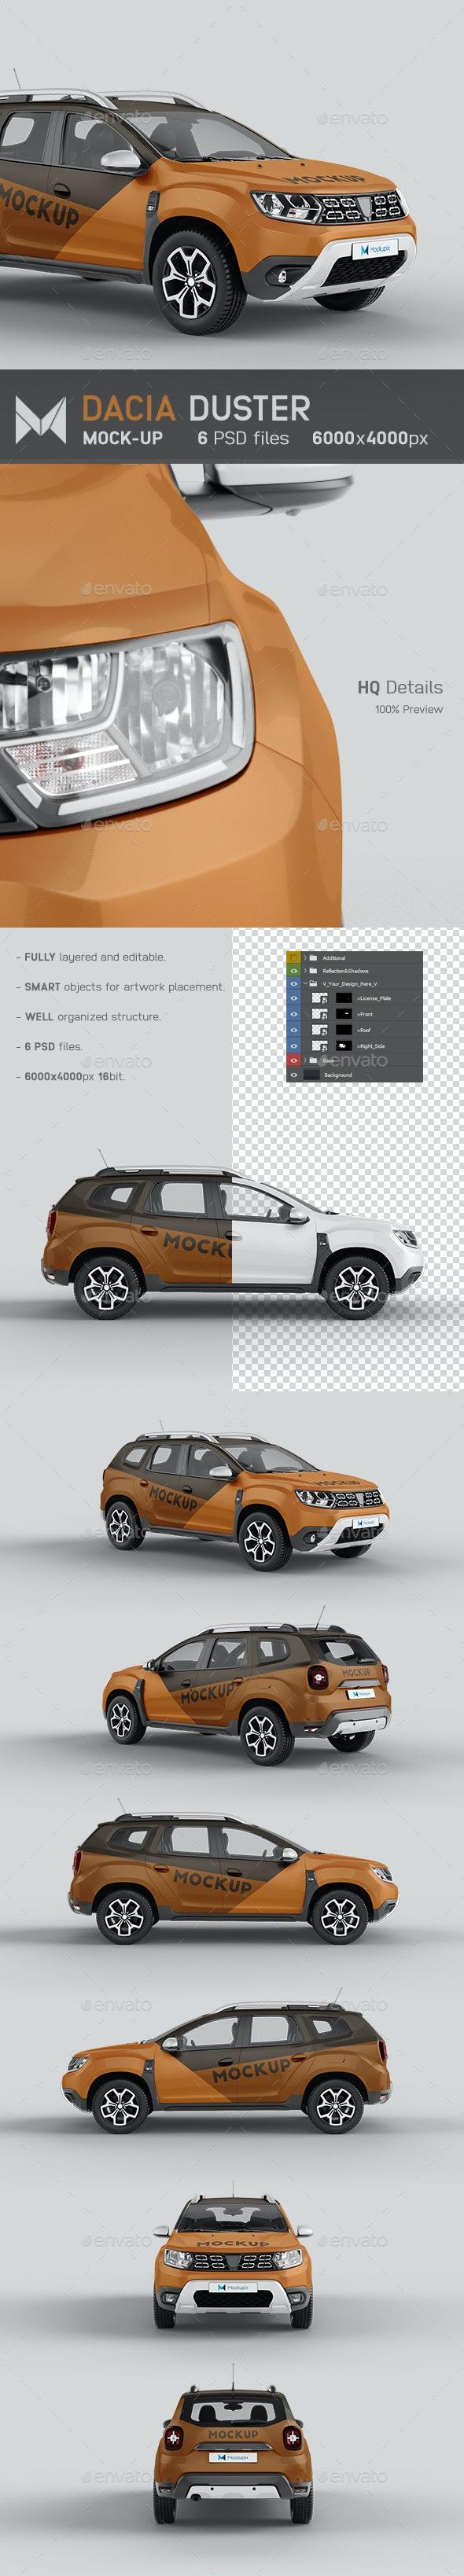 Dacia Duster Car Mockup - Vehicle Wraps Print